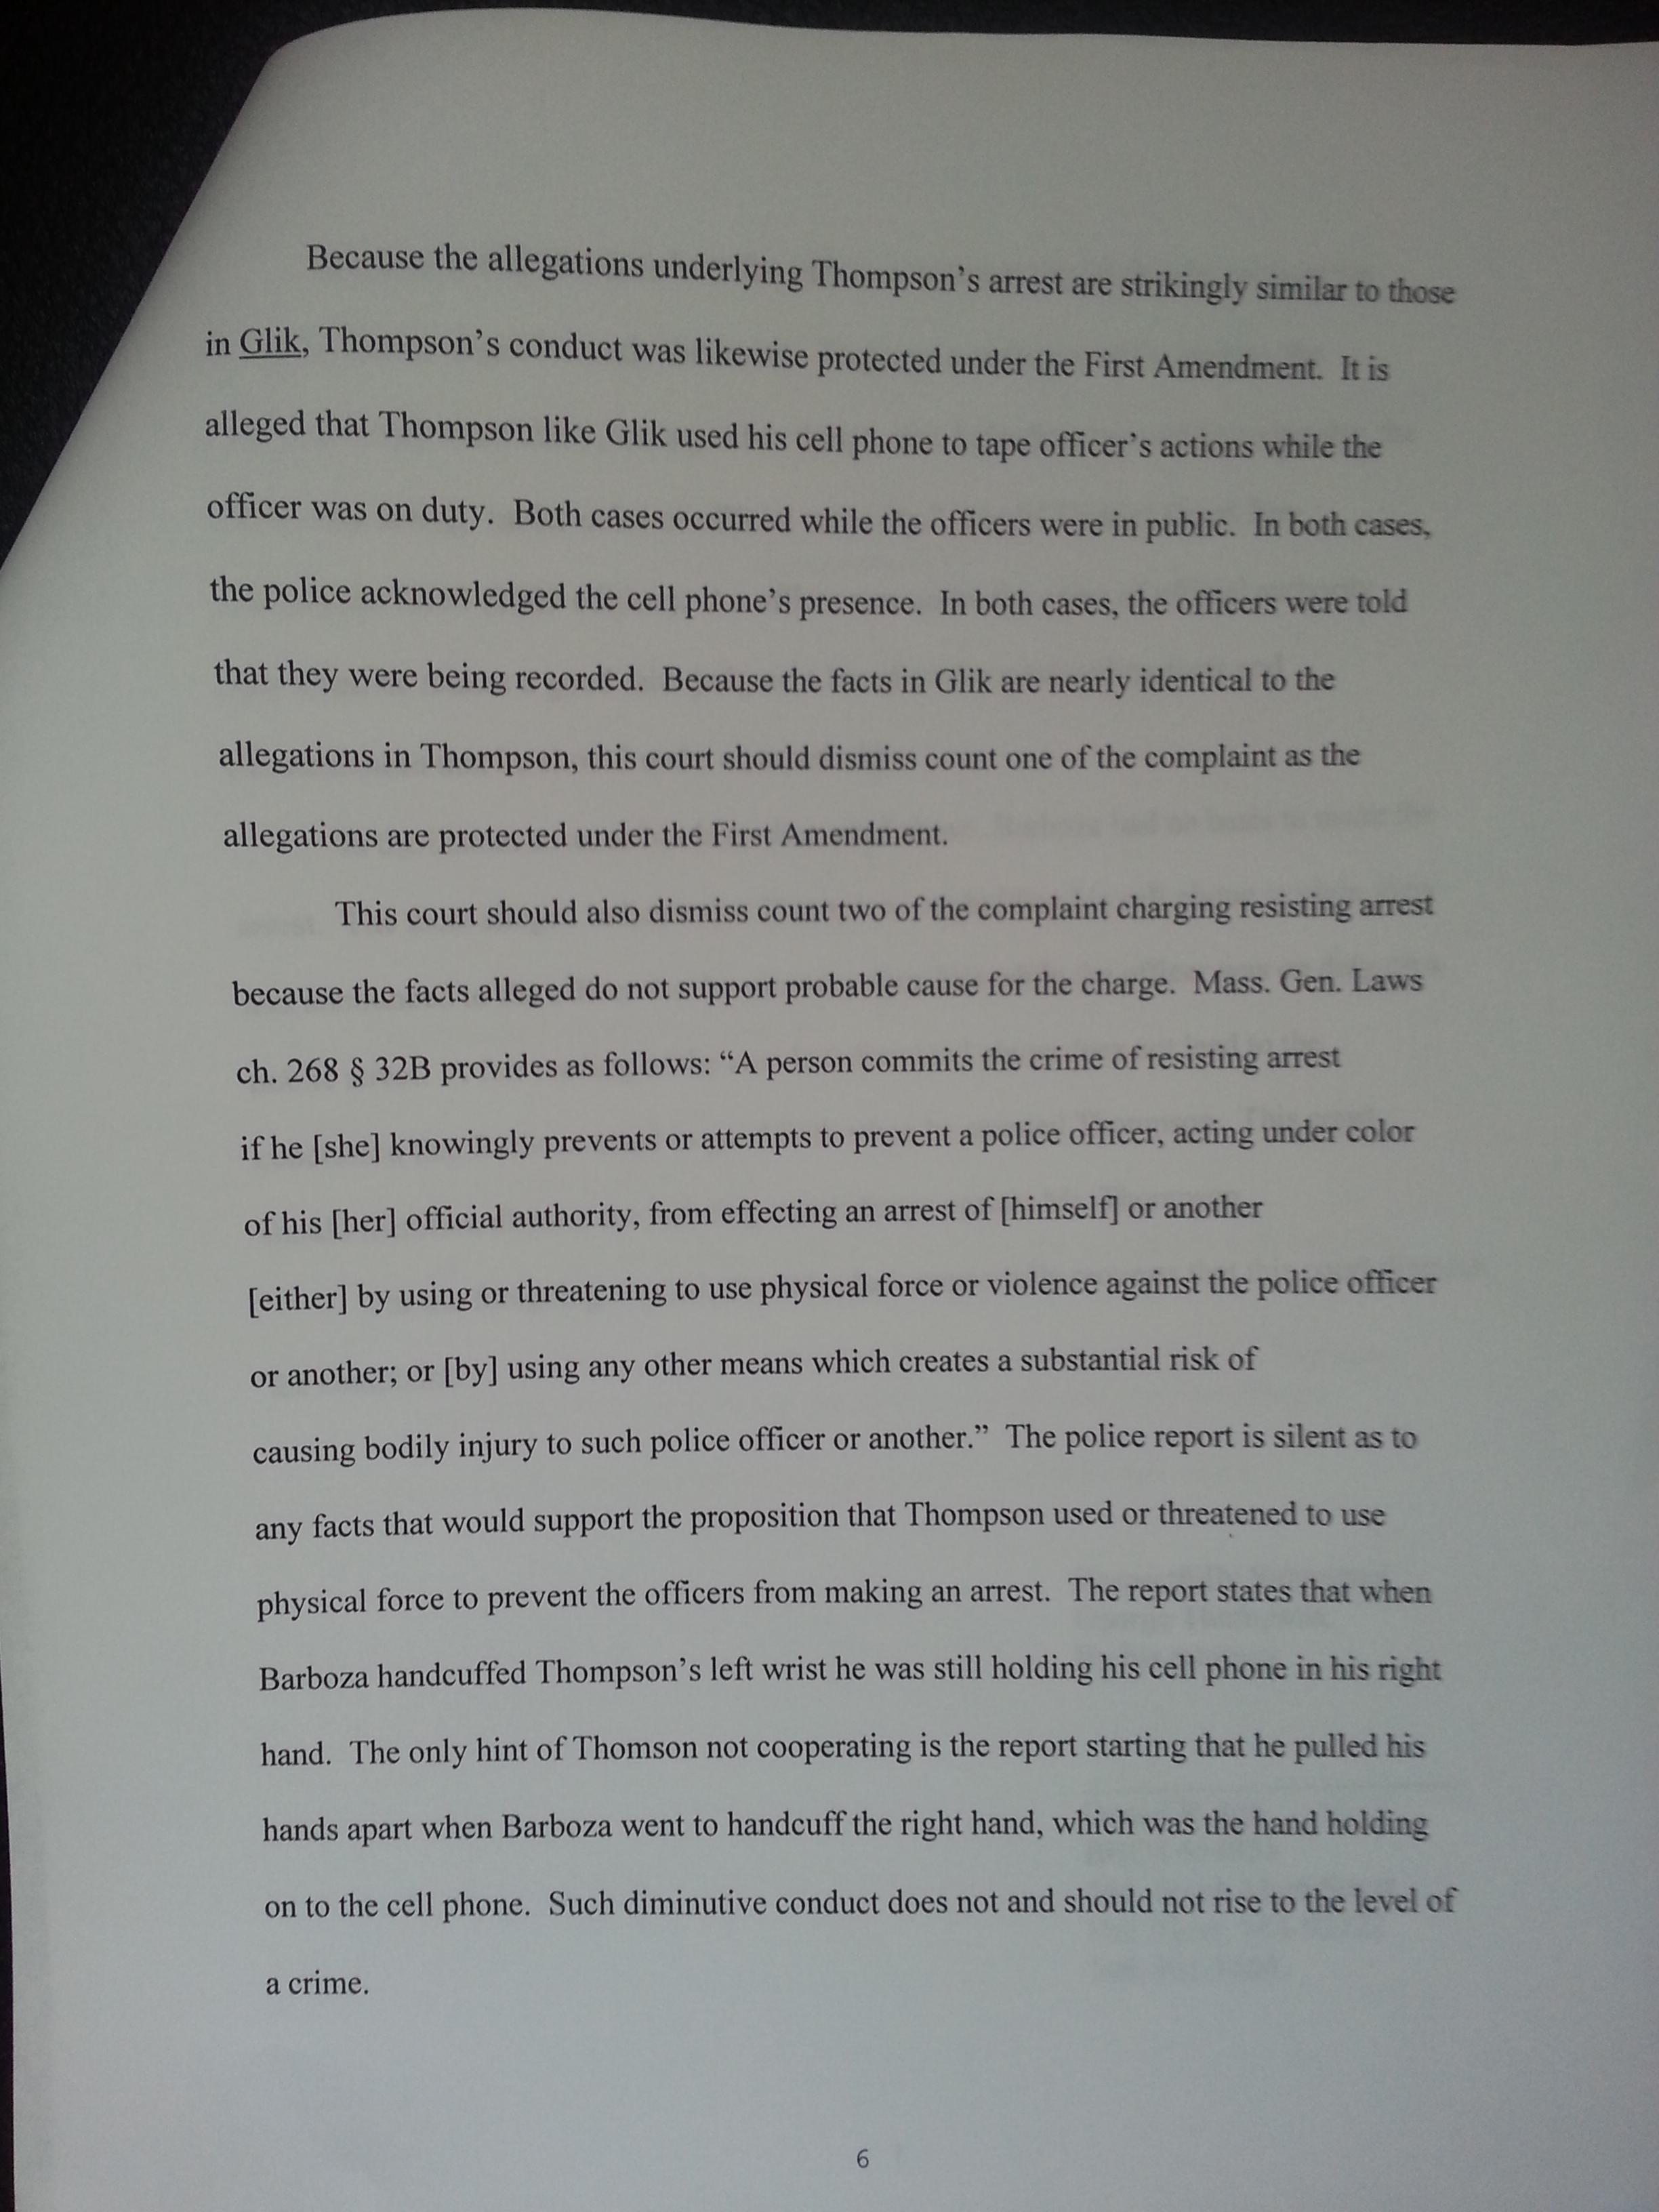 thompson_motion_to_dismiss_p7